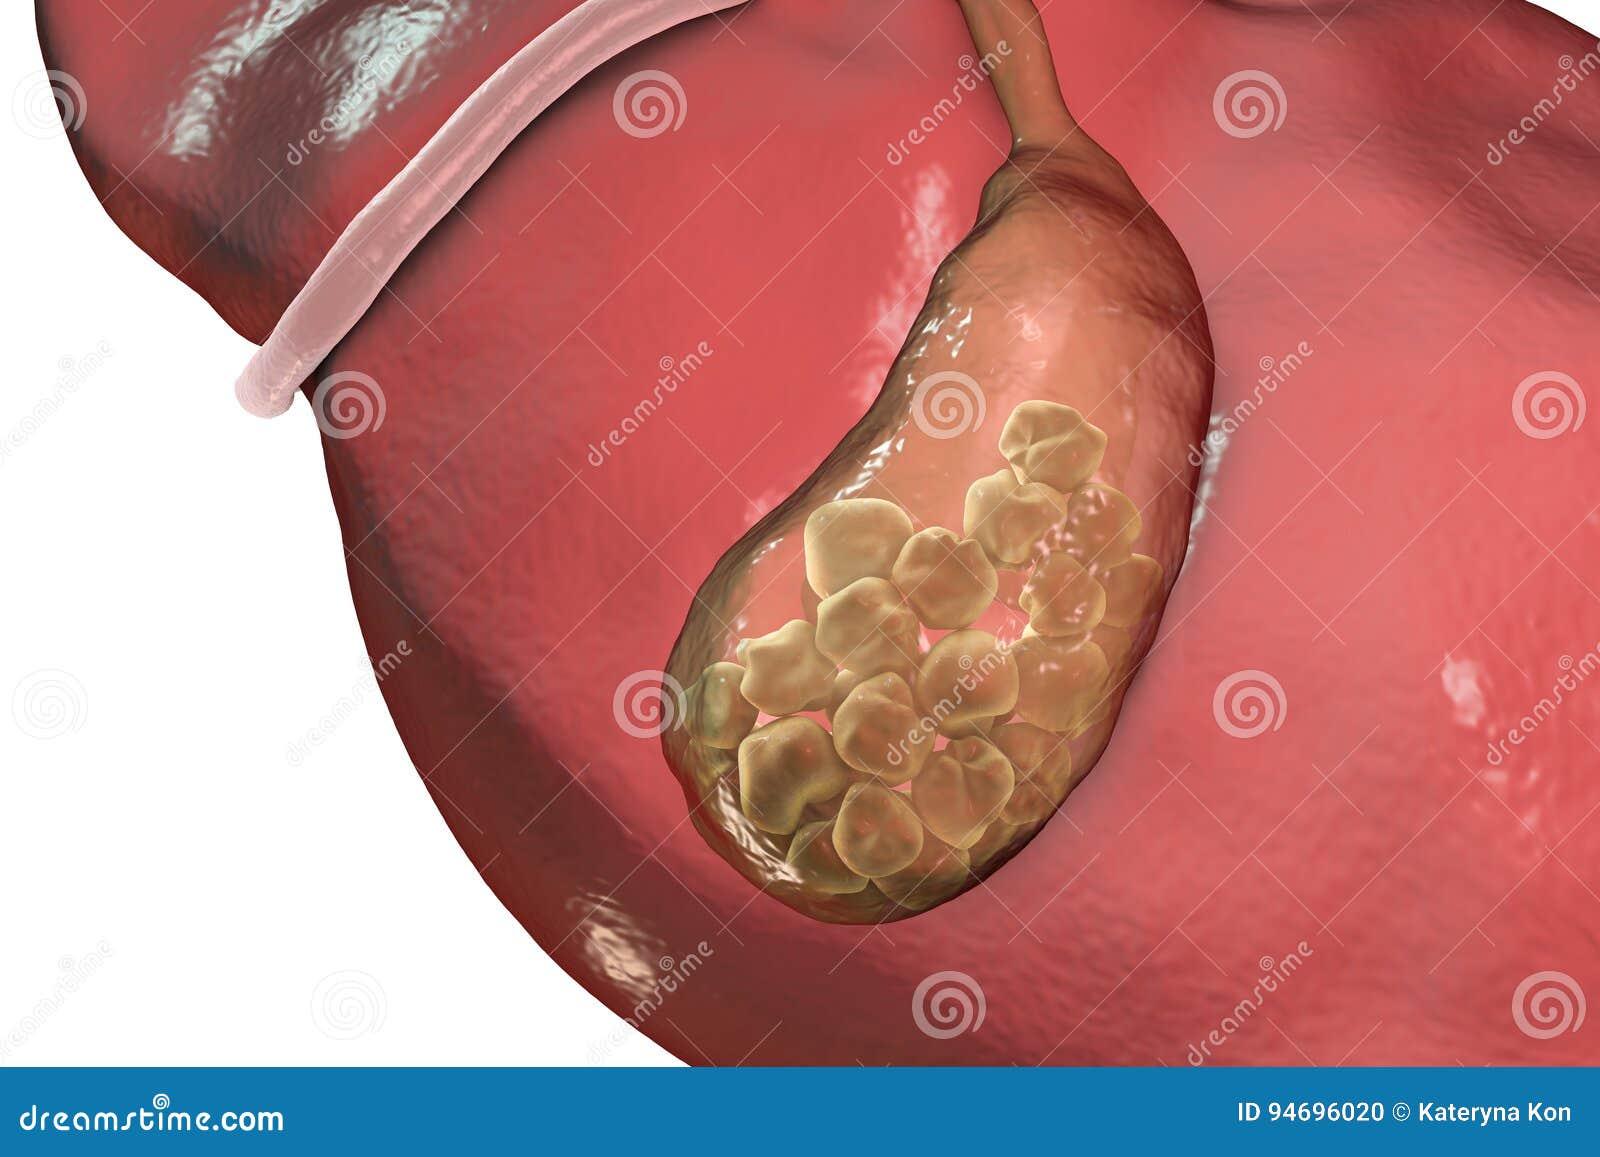 debris in gallbladder - 720×480